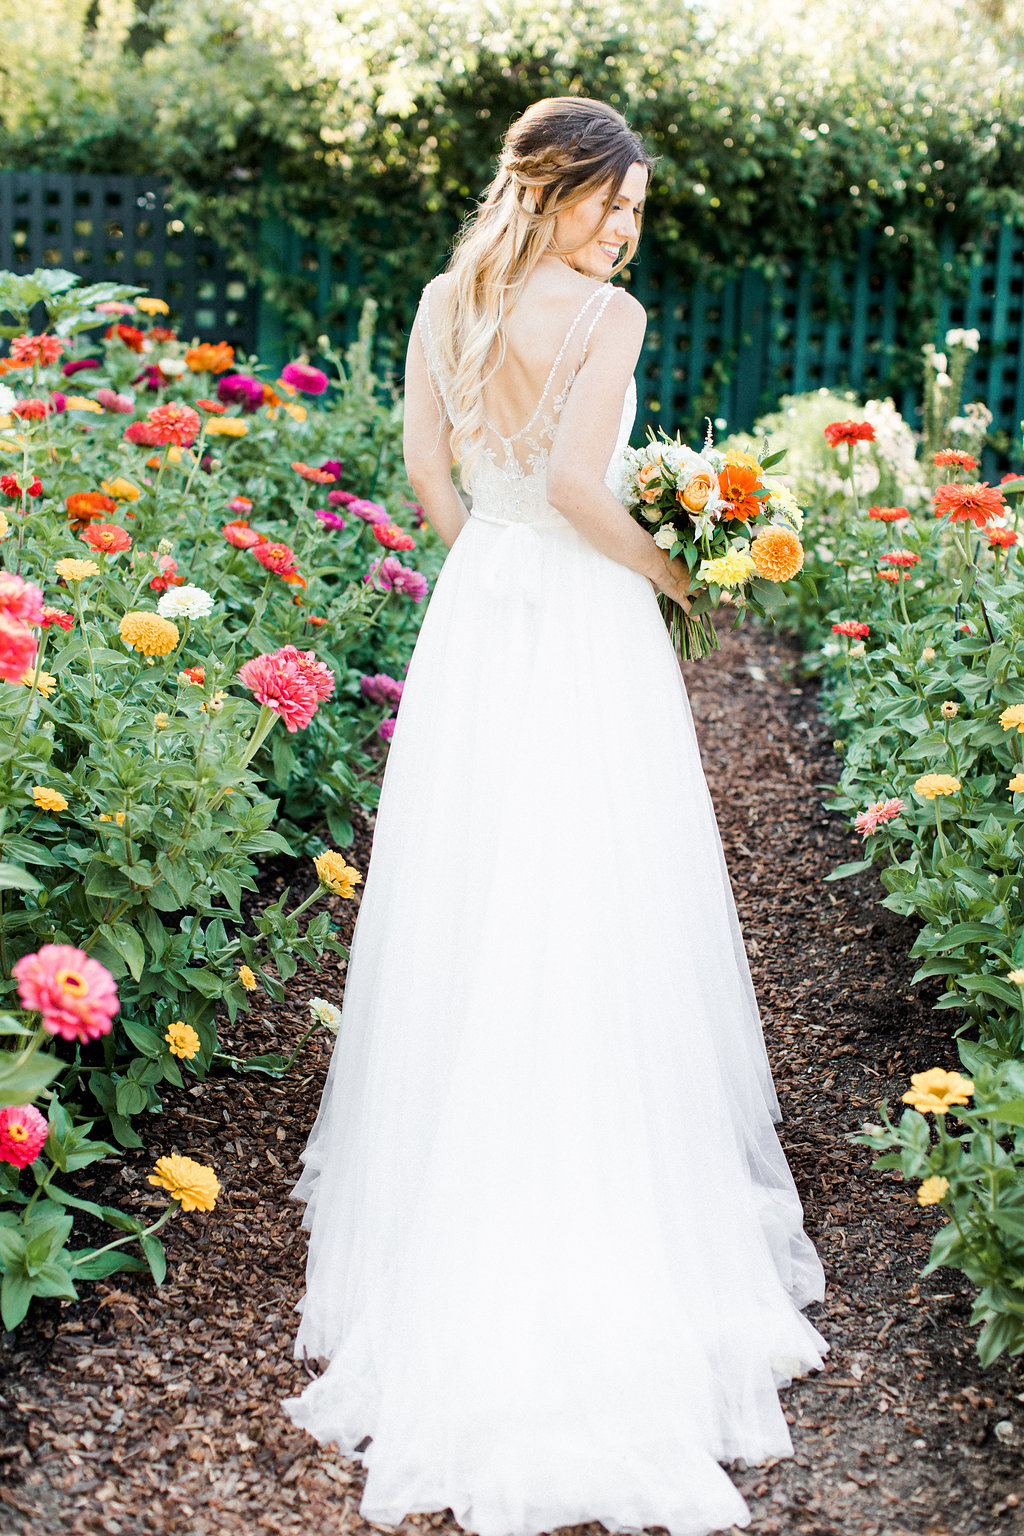 spring wedding dresses - photo by Erin Milnik https://ruffledblog.com/colorful-monday-afternoon-garden-elopement